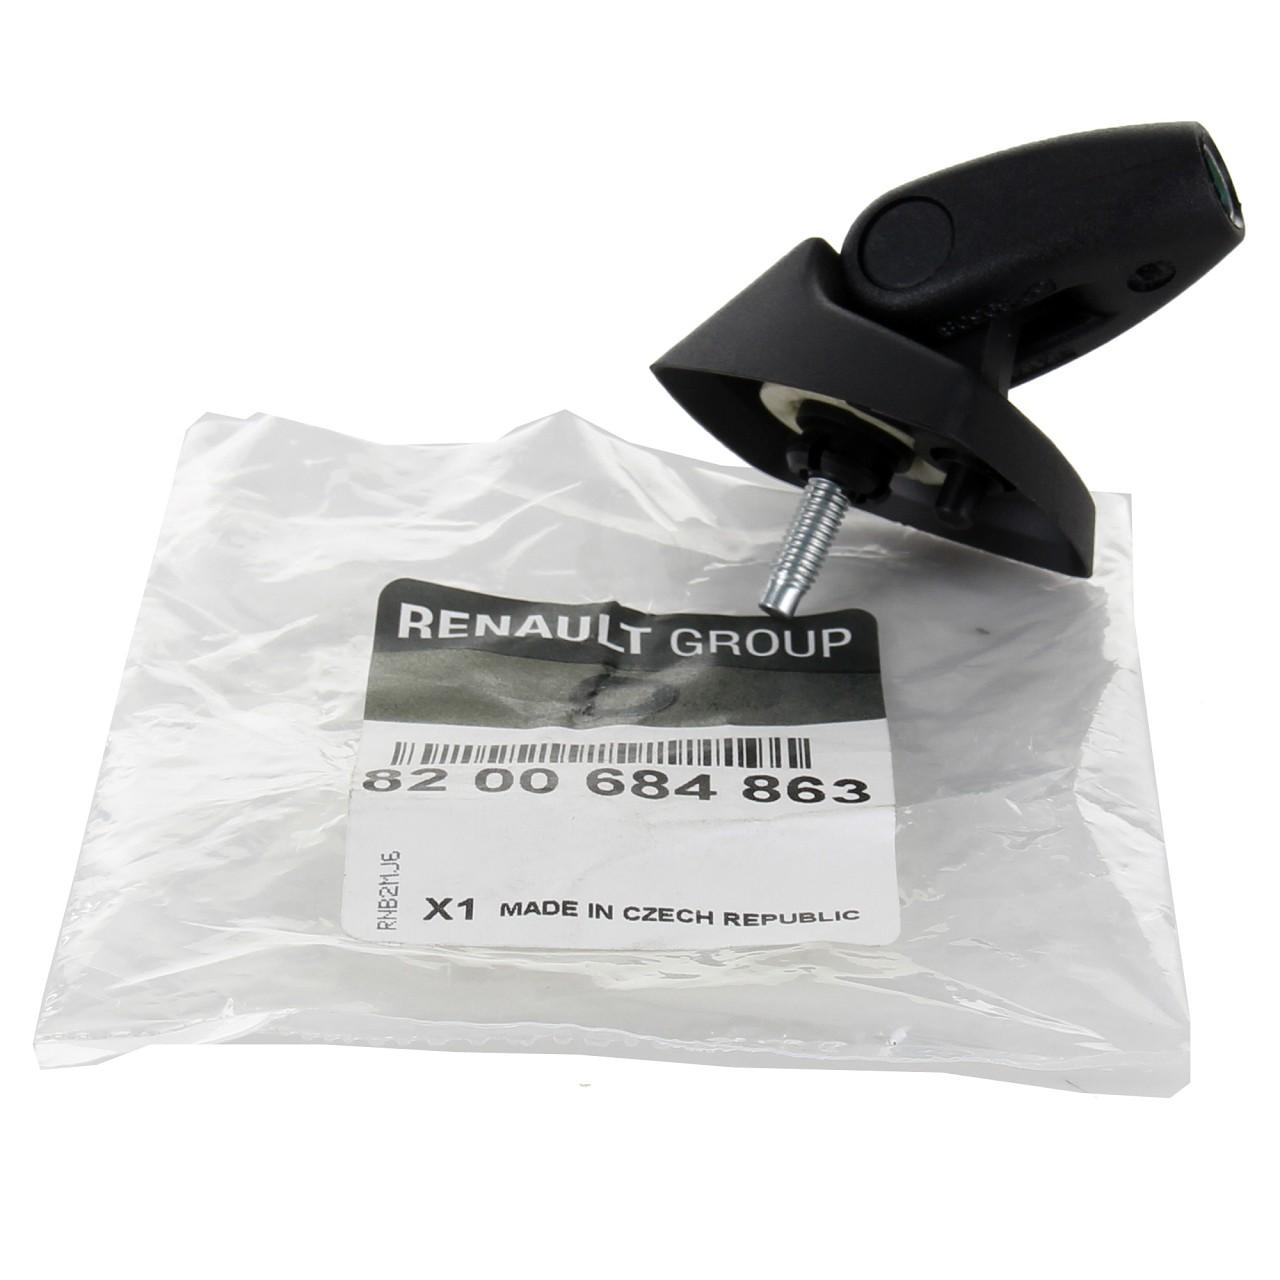 ORIGINAL Renault Antennenfuß Radioantenne CLIO II KANGOO MEGANE I 8200684863